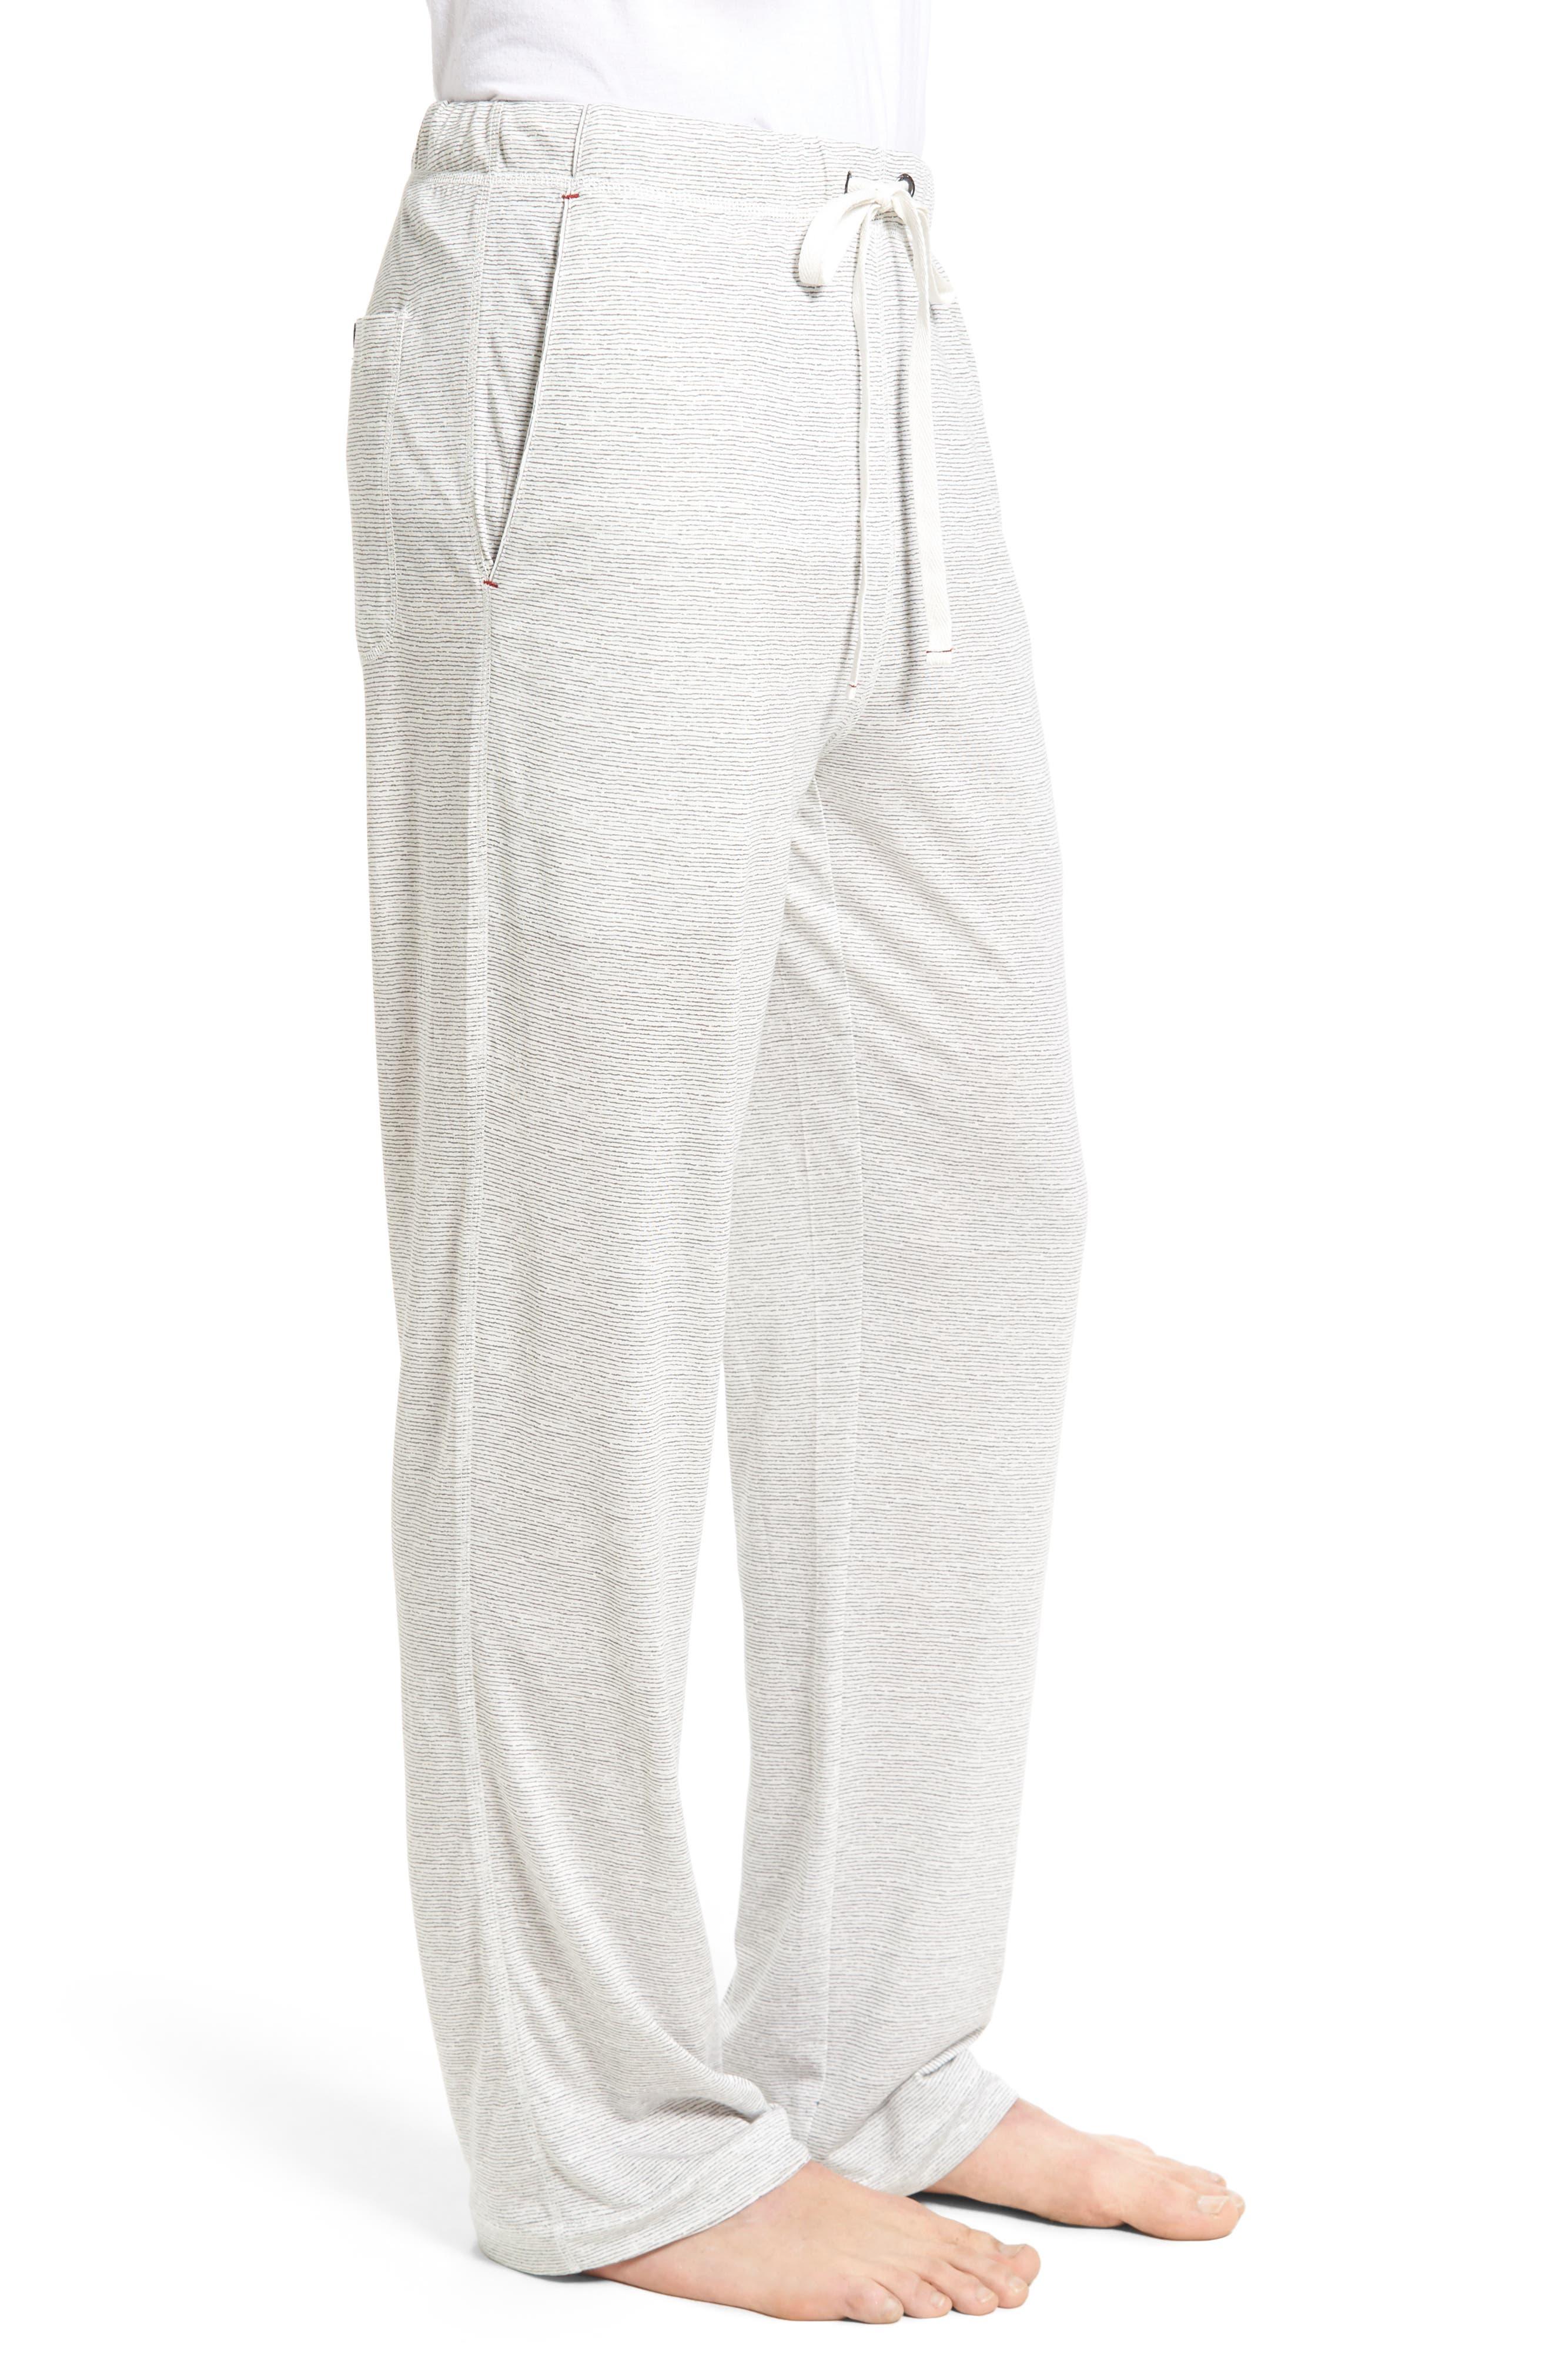 Pima Cotton & Modal Lounge Pants,                             Alternate thumbnail 3, color,                             020